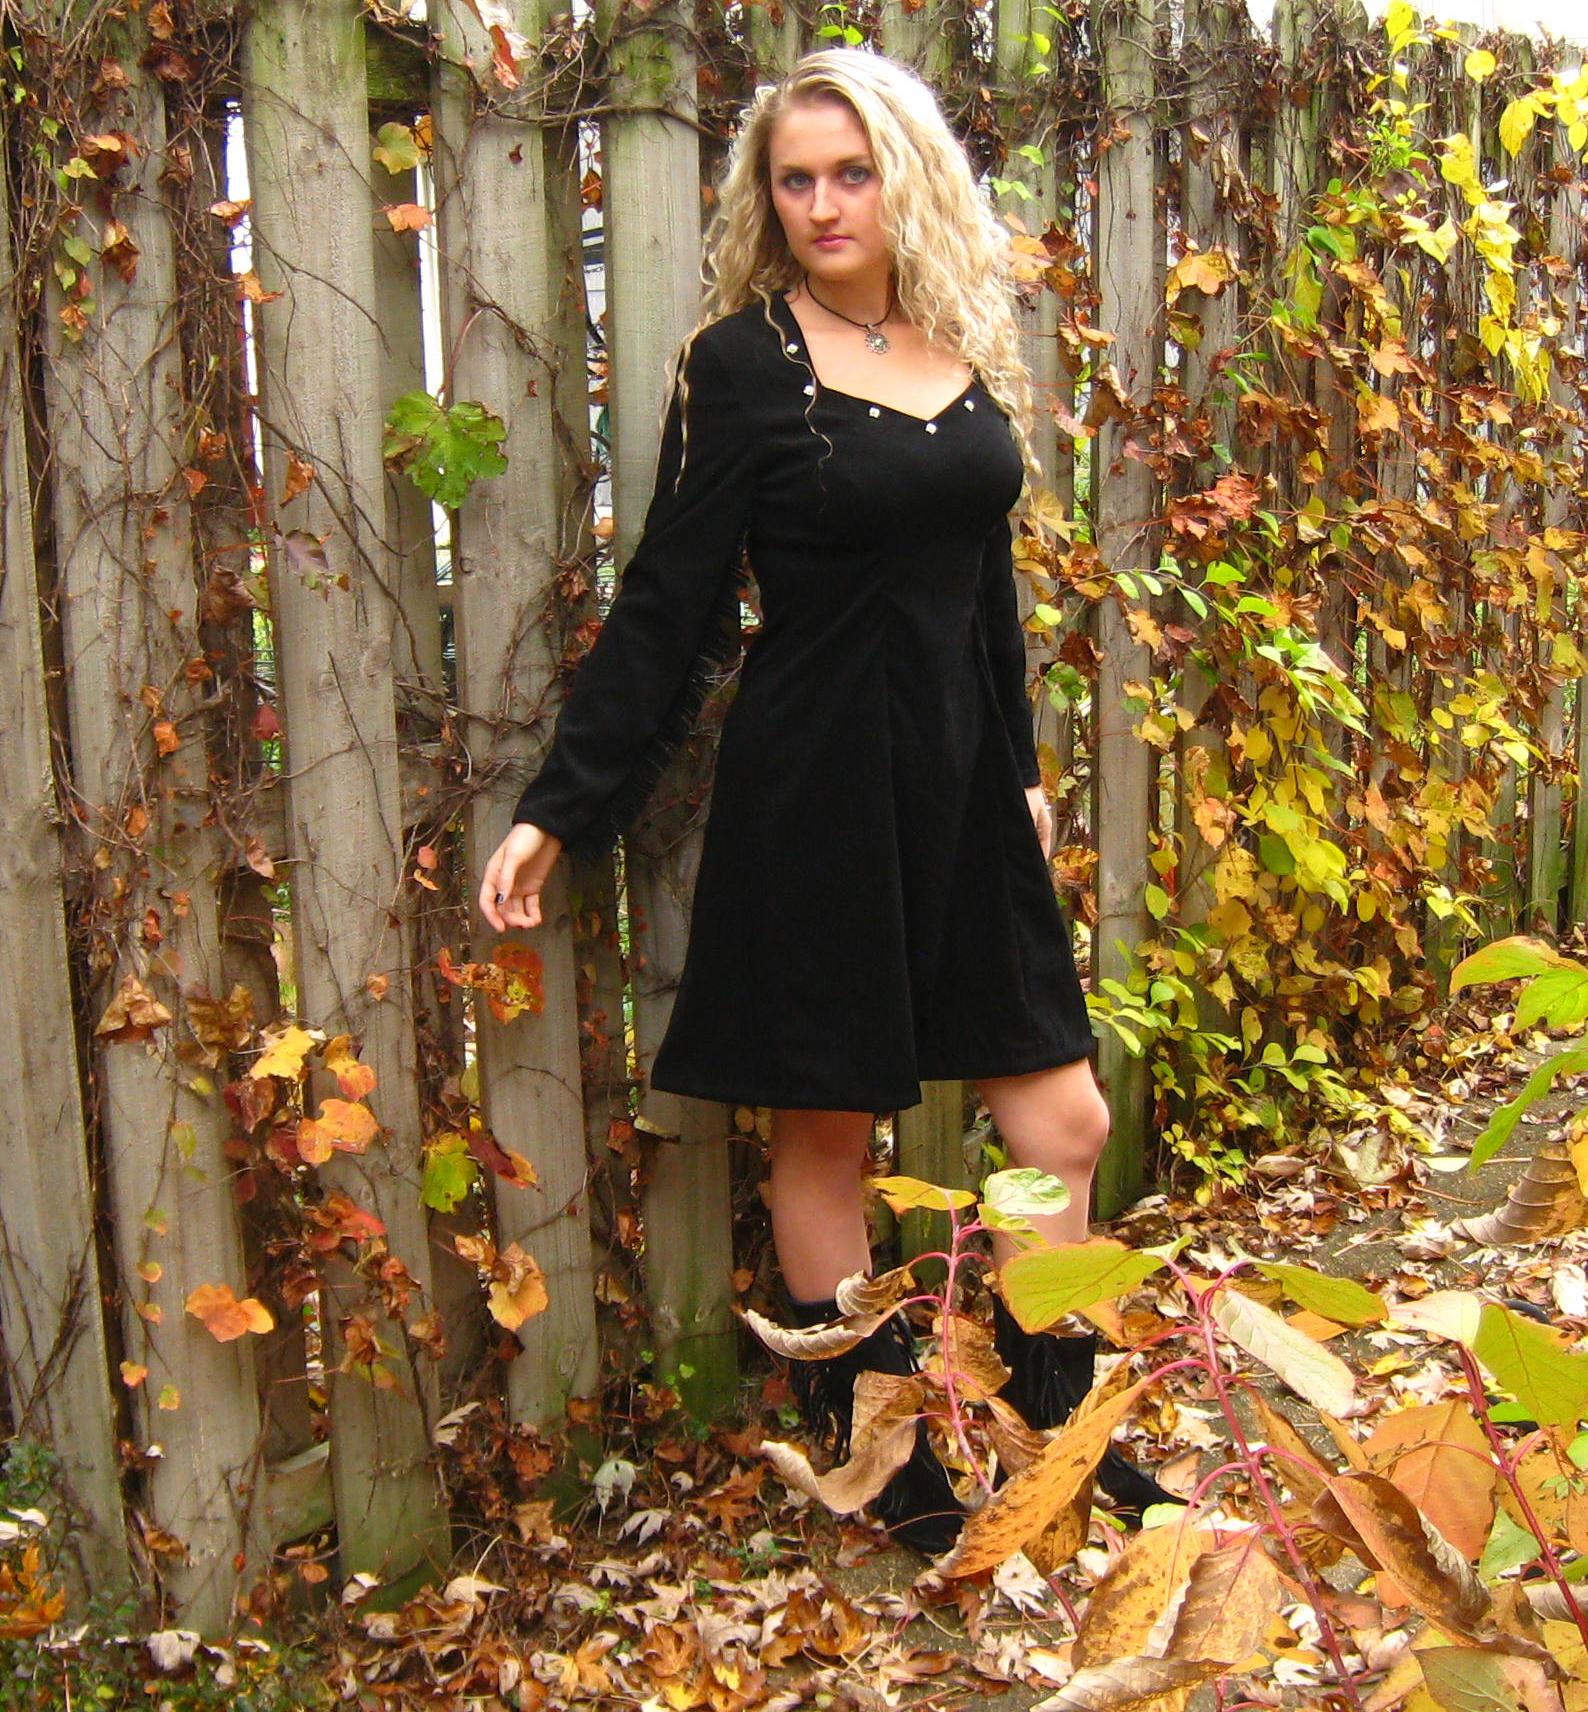 Black Dress view 2 by ThreeRingCinema